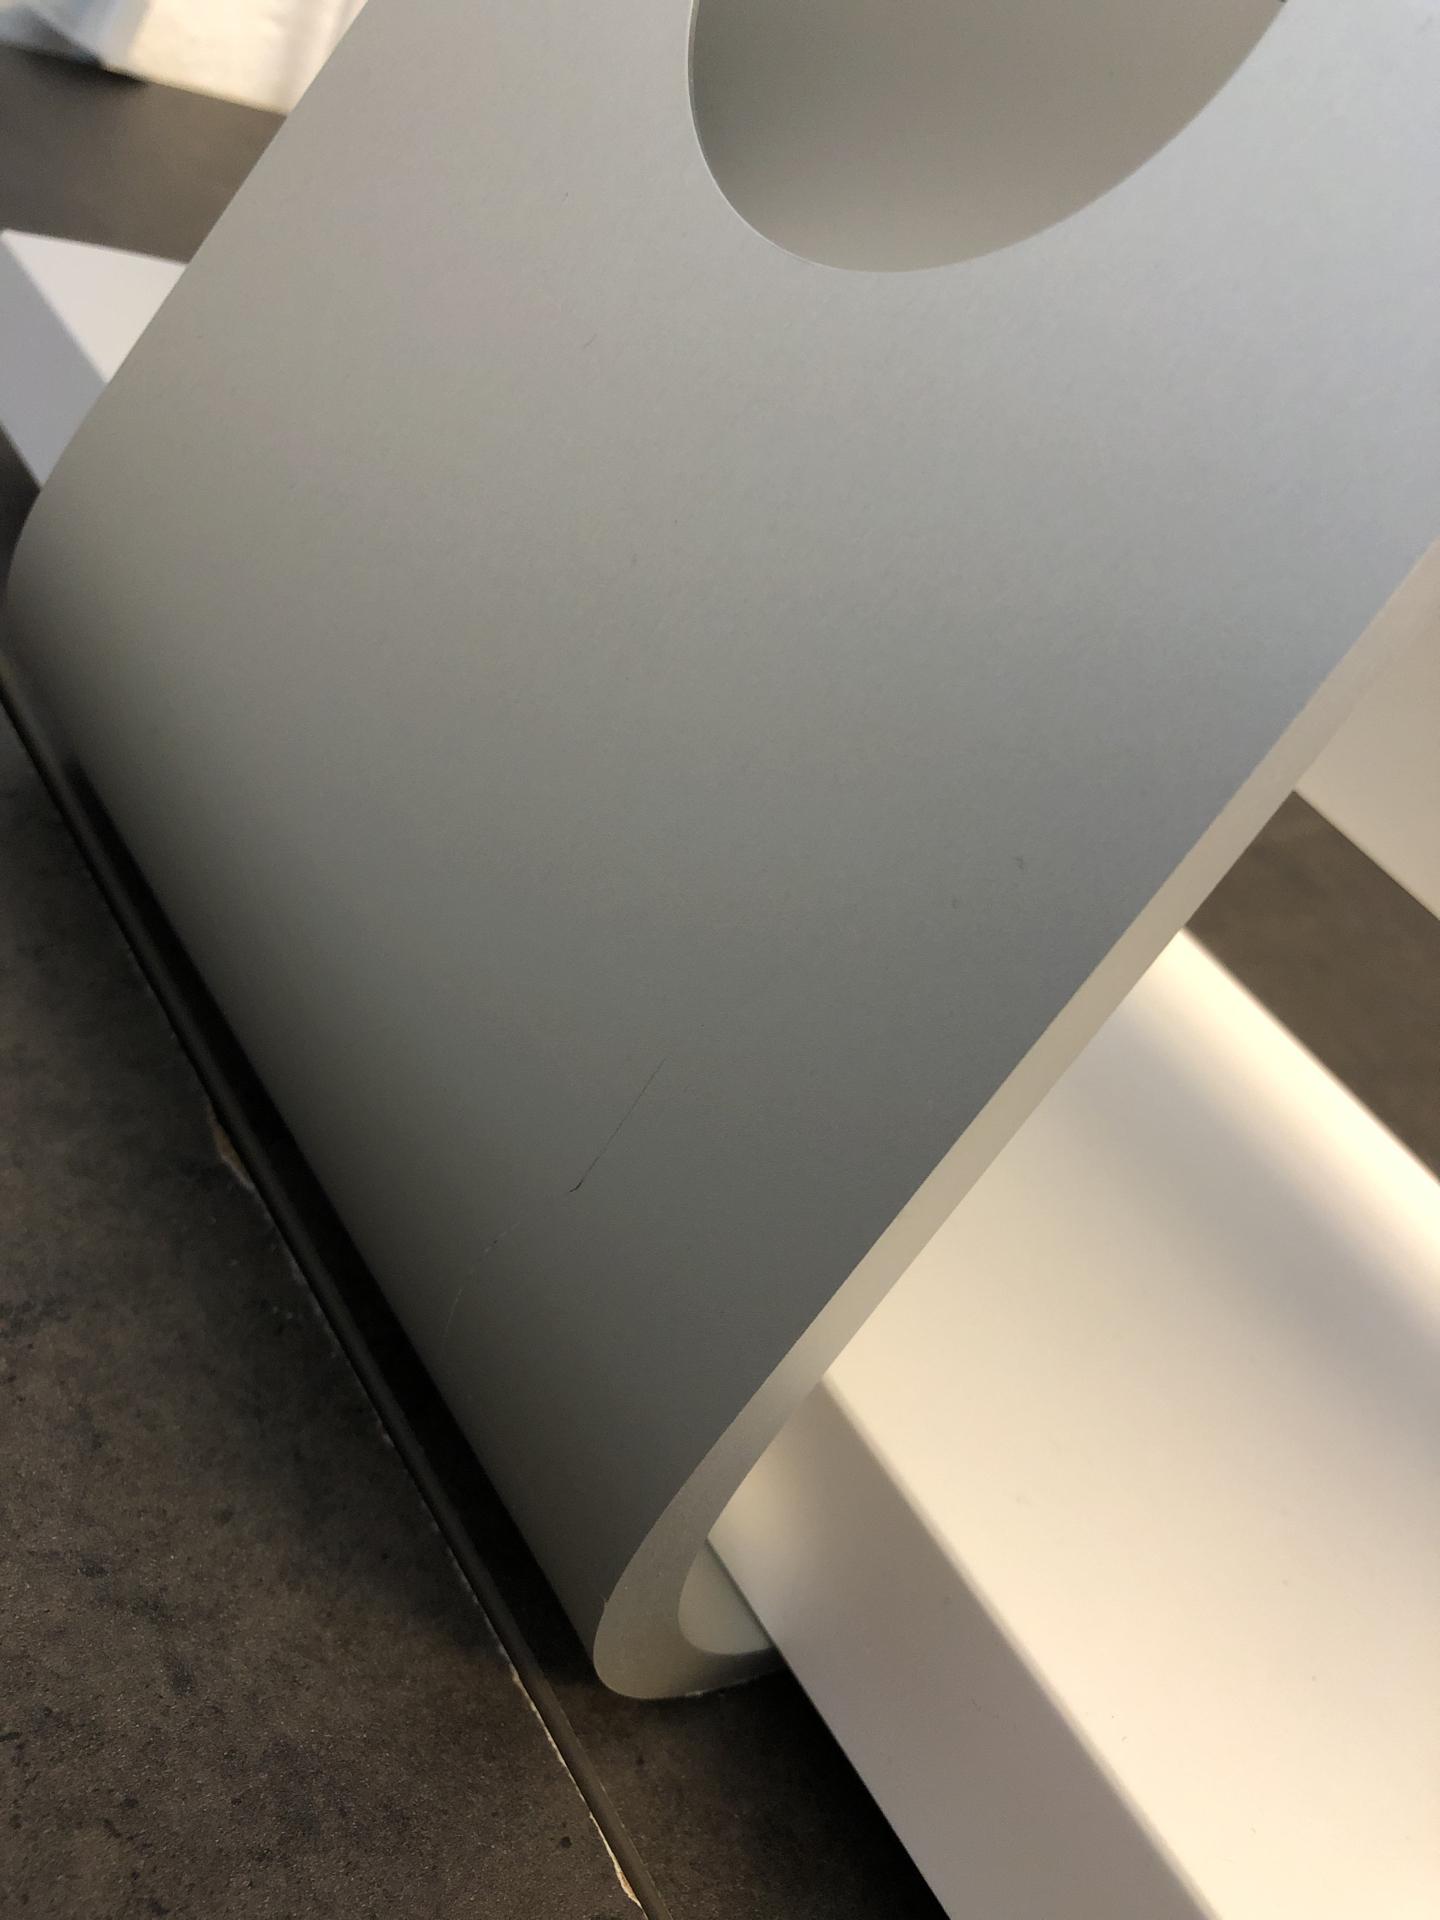 "iMac 27"" Retina 5K Early 2019 (Intel 6-Core i5 3.0 GHz 16 GB RAM 1 TB Fusion Drive), Intel 6-Core i5 3.0 GHz, 16 GB RAM, 1 TB Fusion Drive, Kuva 3"